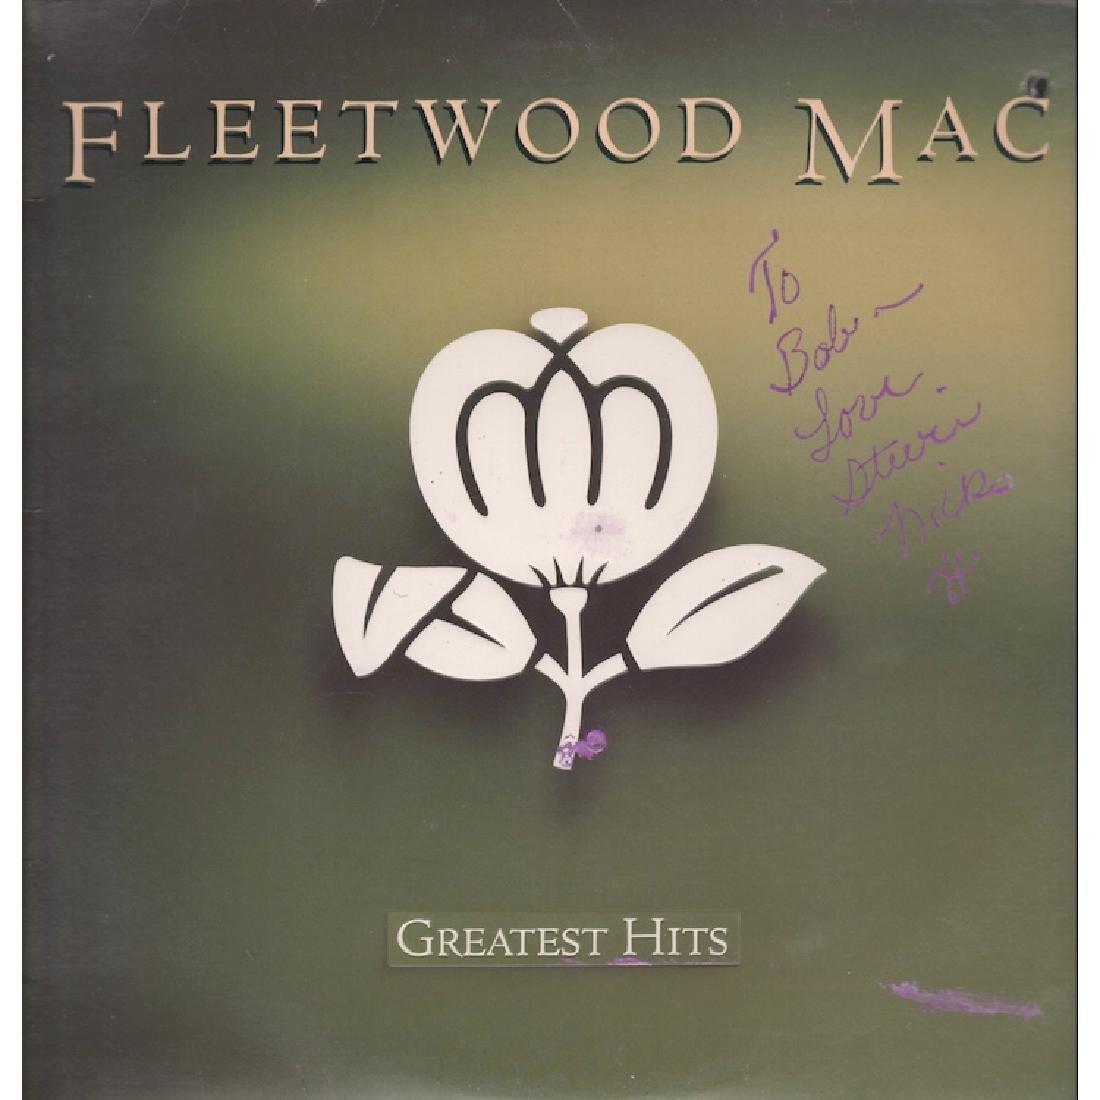 Stevie Nicks - Fleetwood Mac - Autographed Album